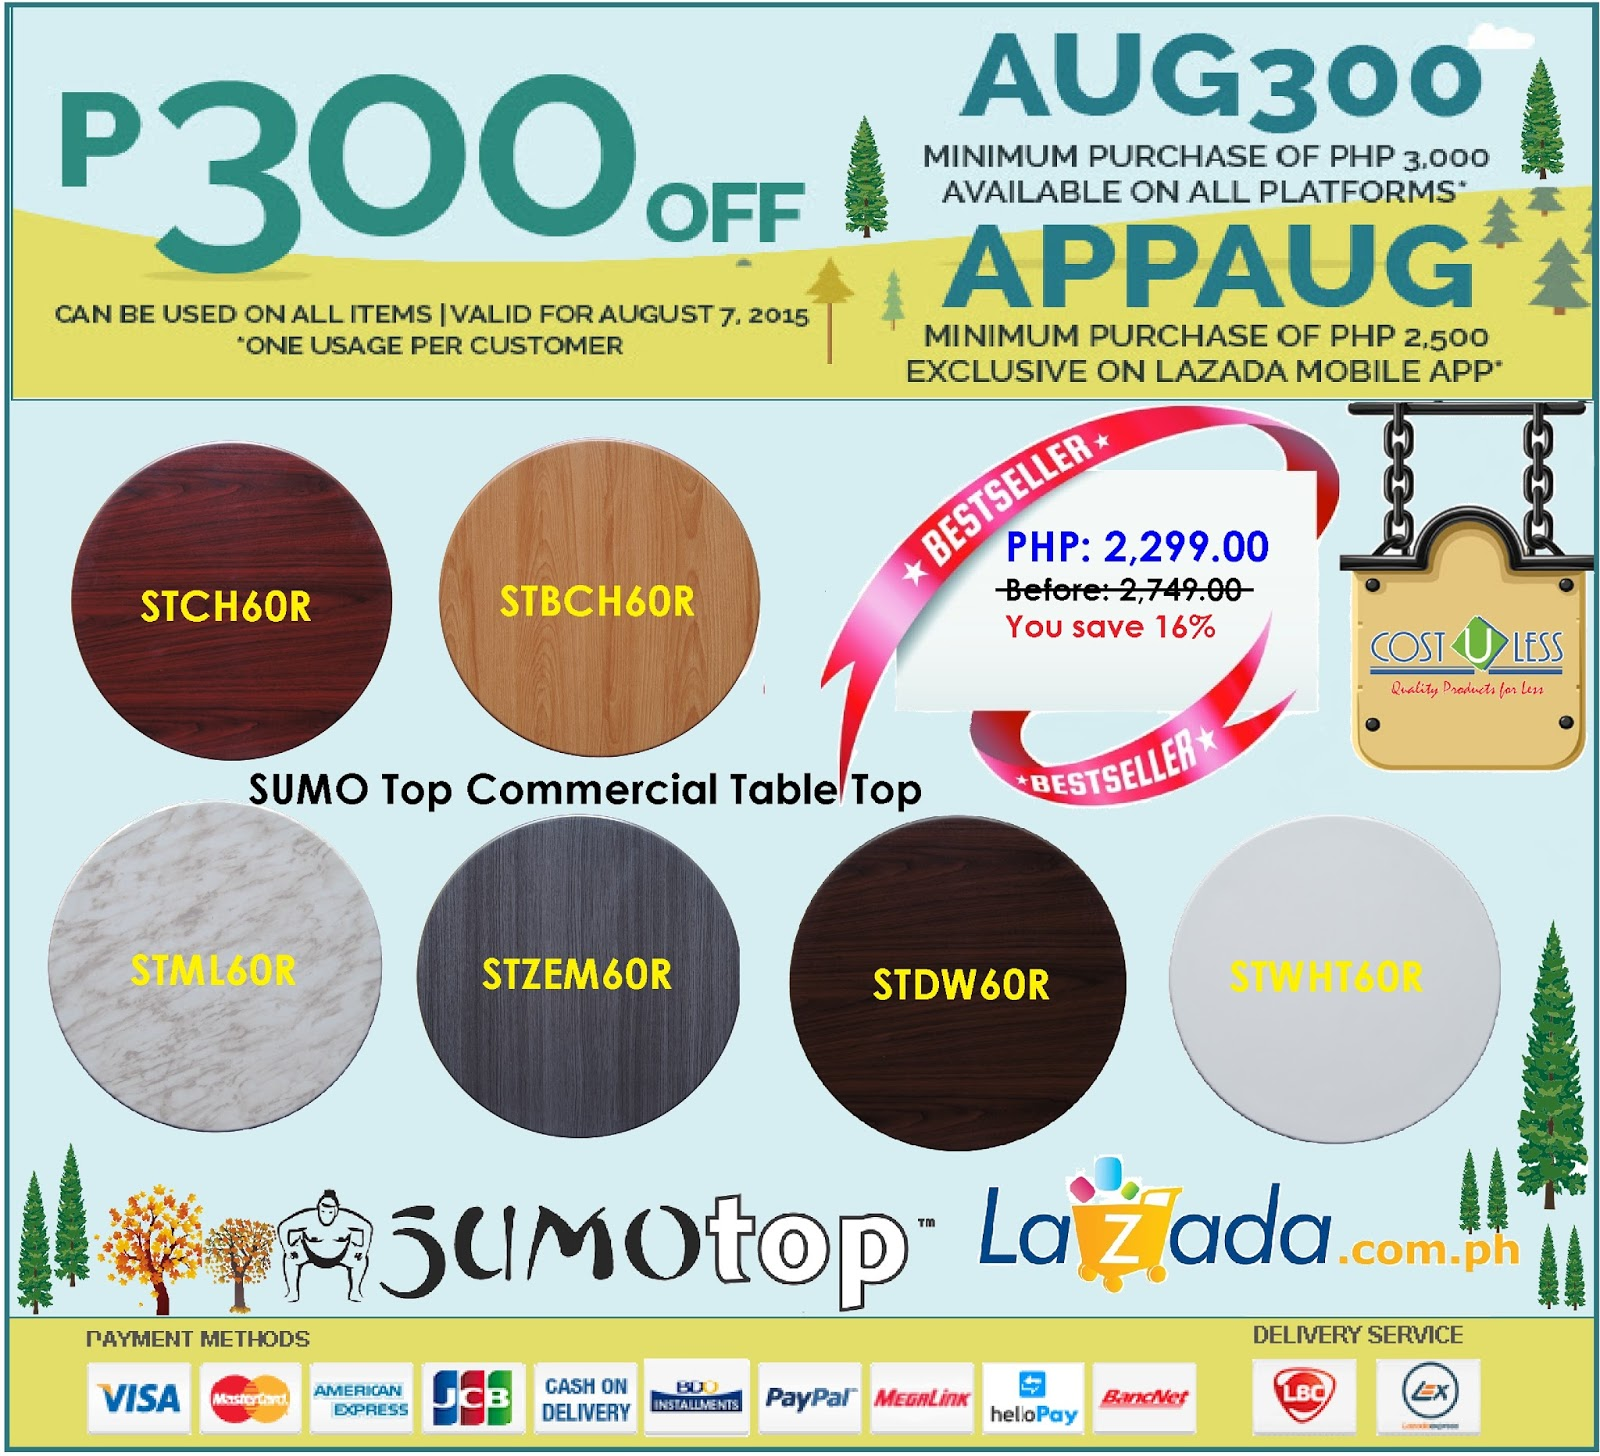 Cost U LessOffice Furniture ManilaFurniture Supplier ManilaWindow - Restaurant table cost